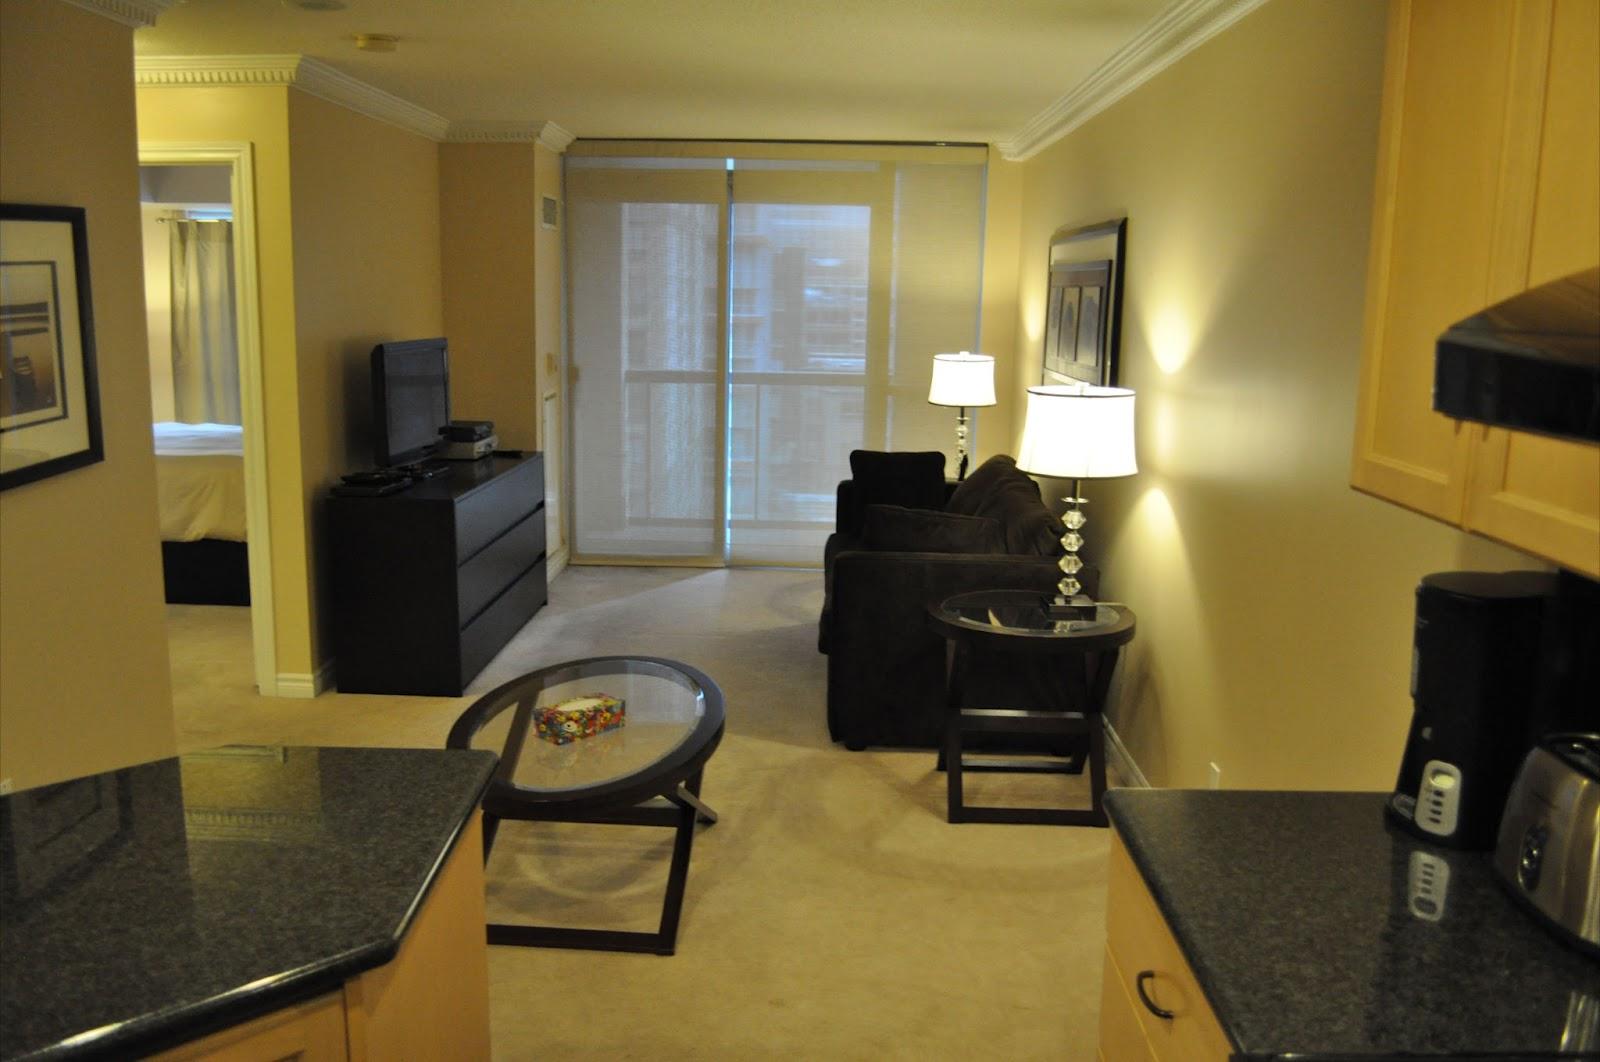 2 Bedroom Furnished Apartments Toronto